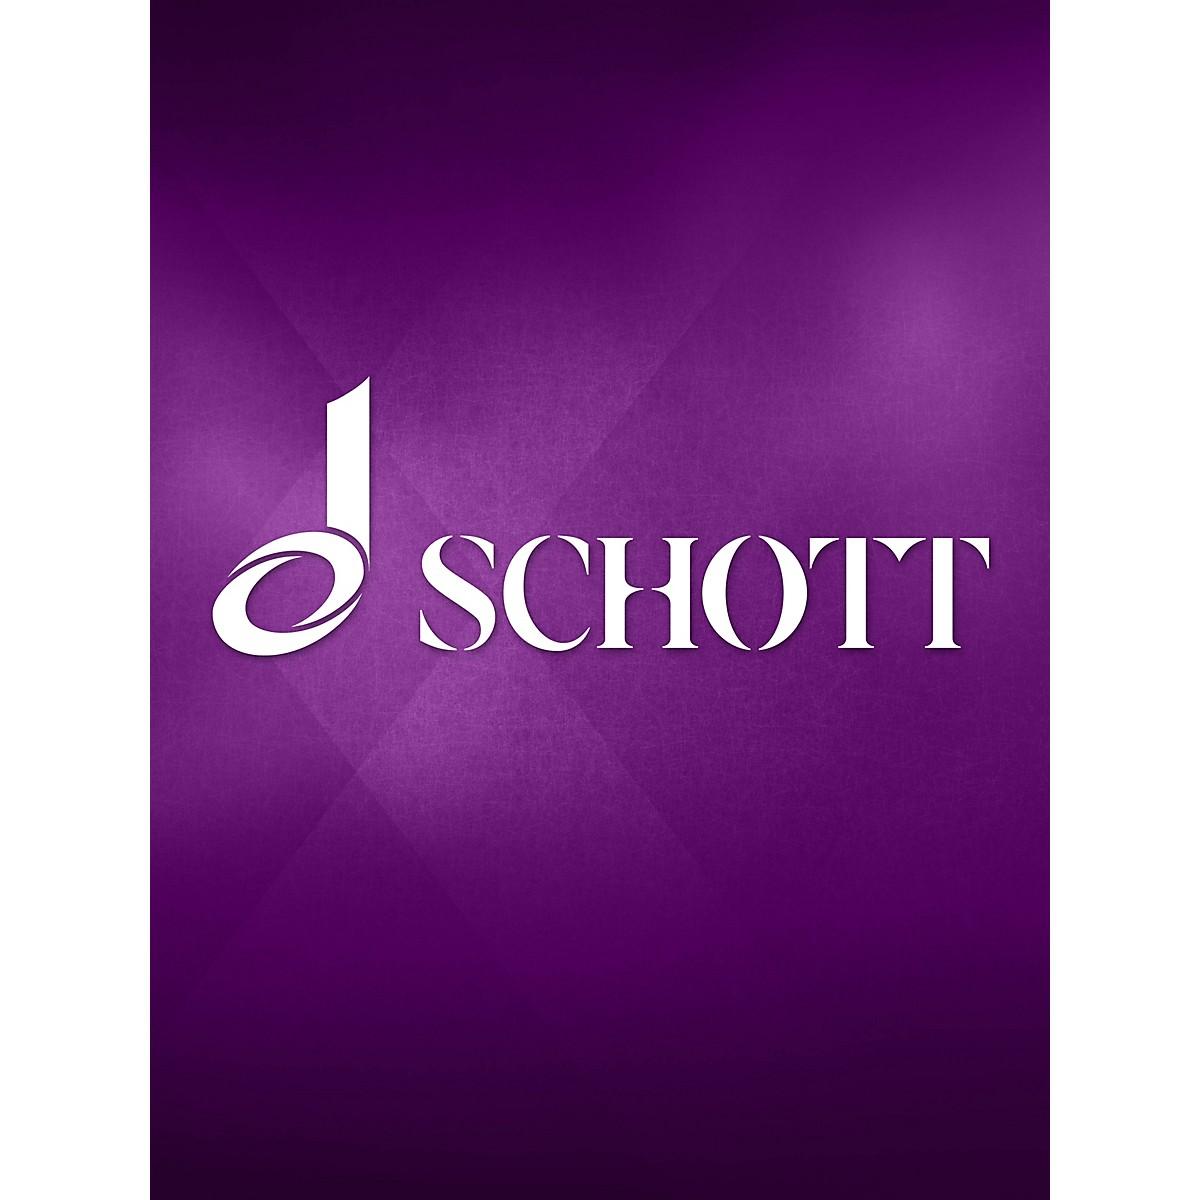 Schott Wind Songs (for Unison Children's Choir and Orff Instruments - Score)